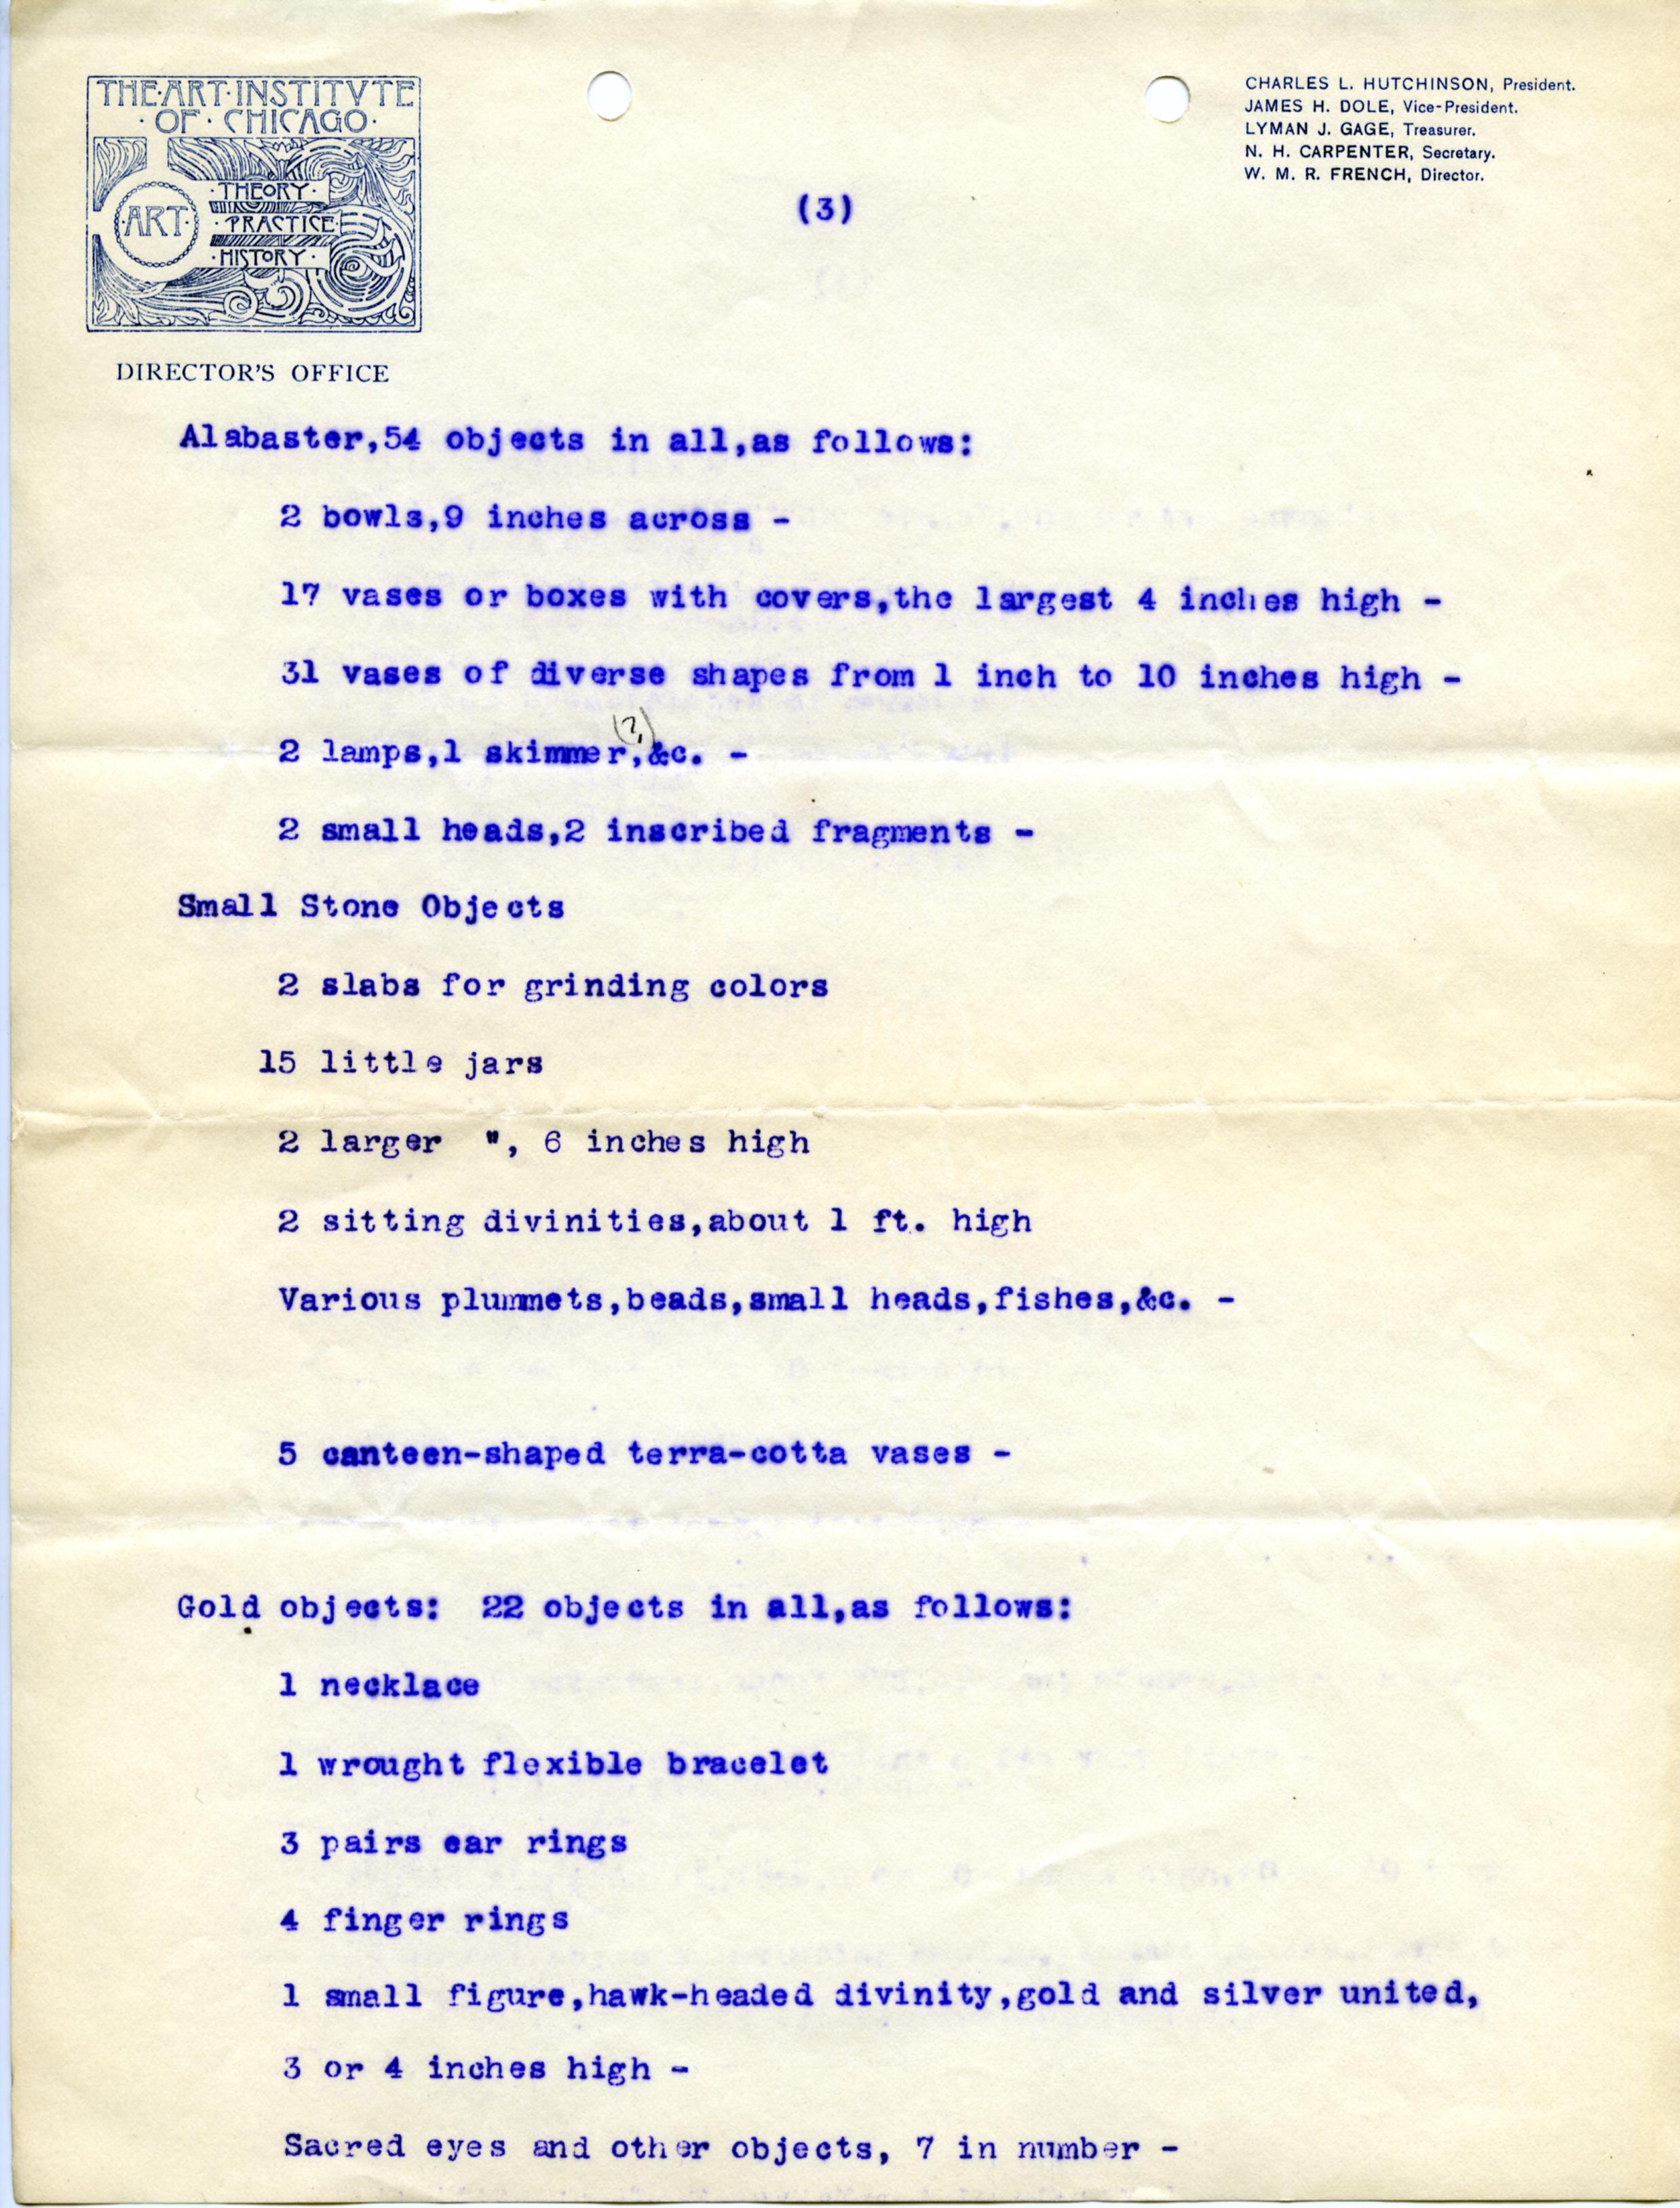 1892-93, 1893-94, 1894-95, 1895-96 Deir el-Bahri DIST.12.01c